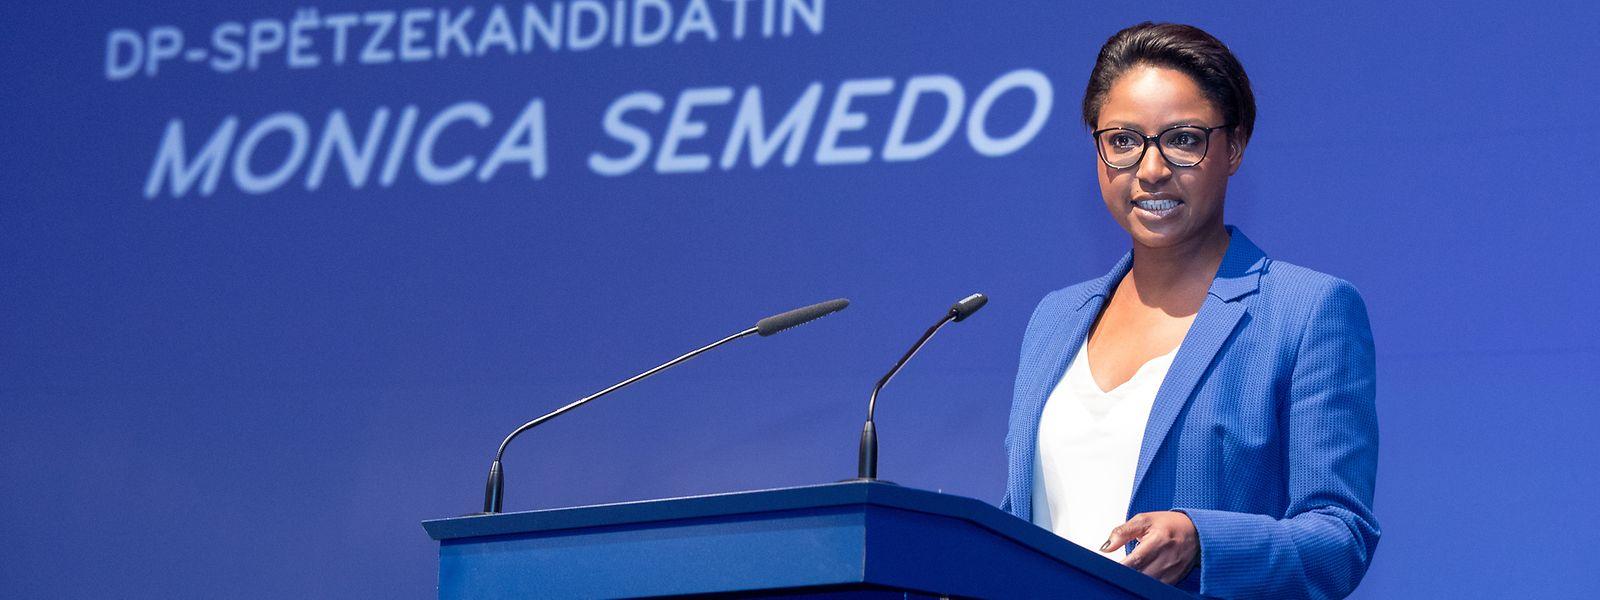 Monica Semedo.